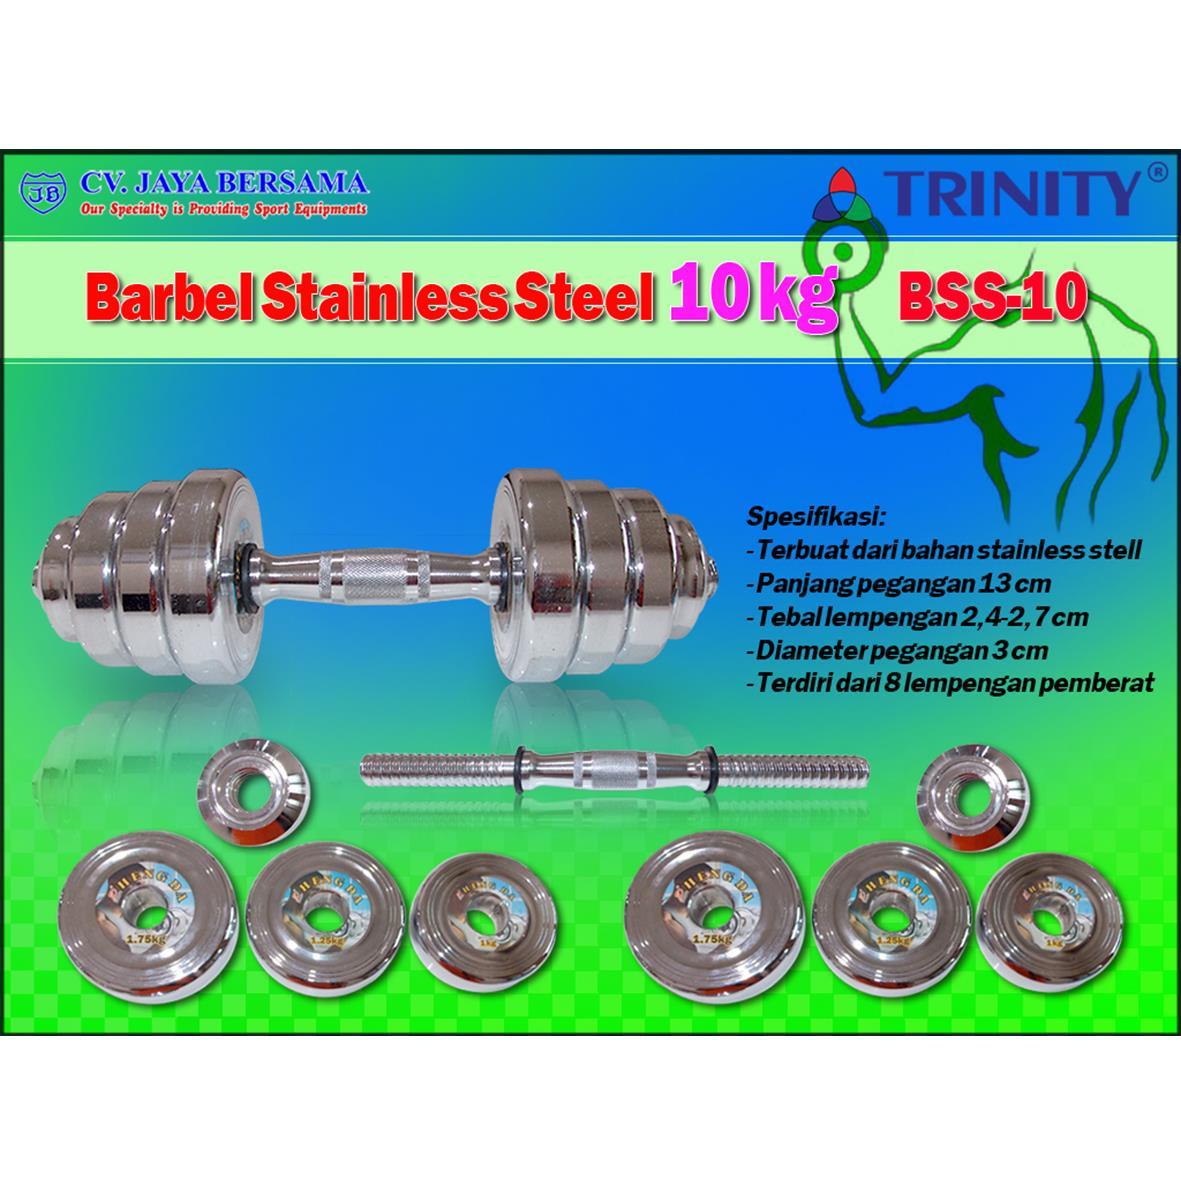 Sell Barbel Stainless Steel 10kg Bss 10 From Indonesia By Cv Jaya Kg Bersamacheap Price